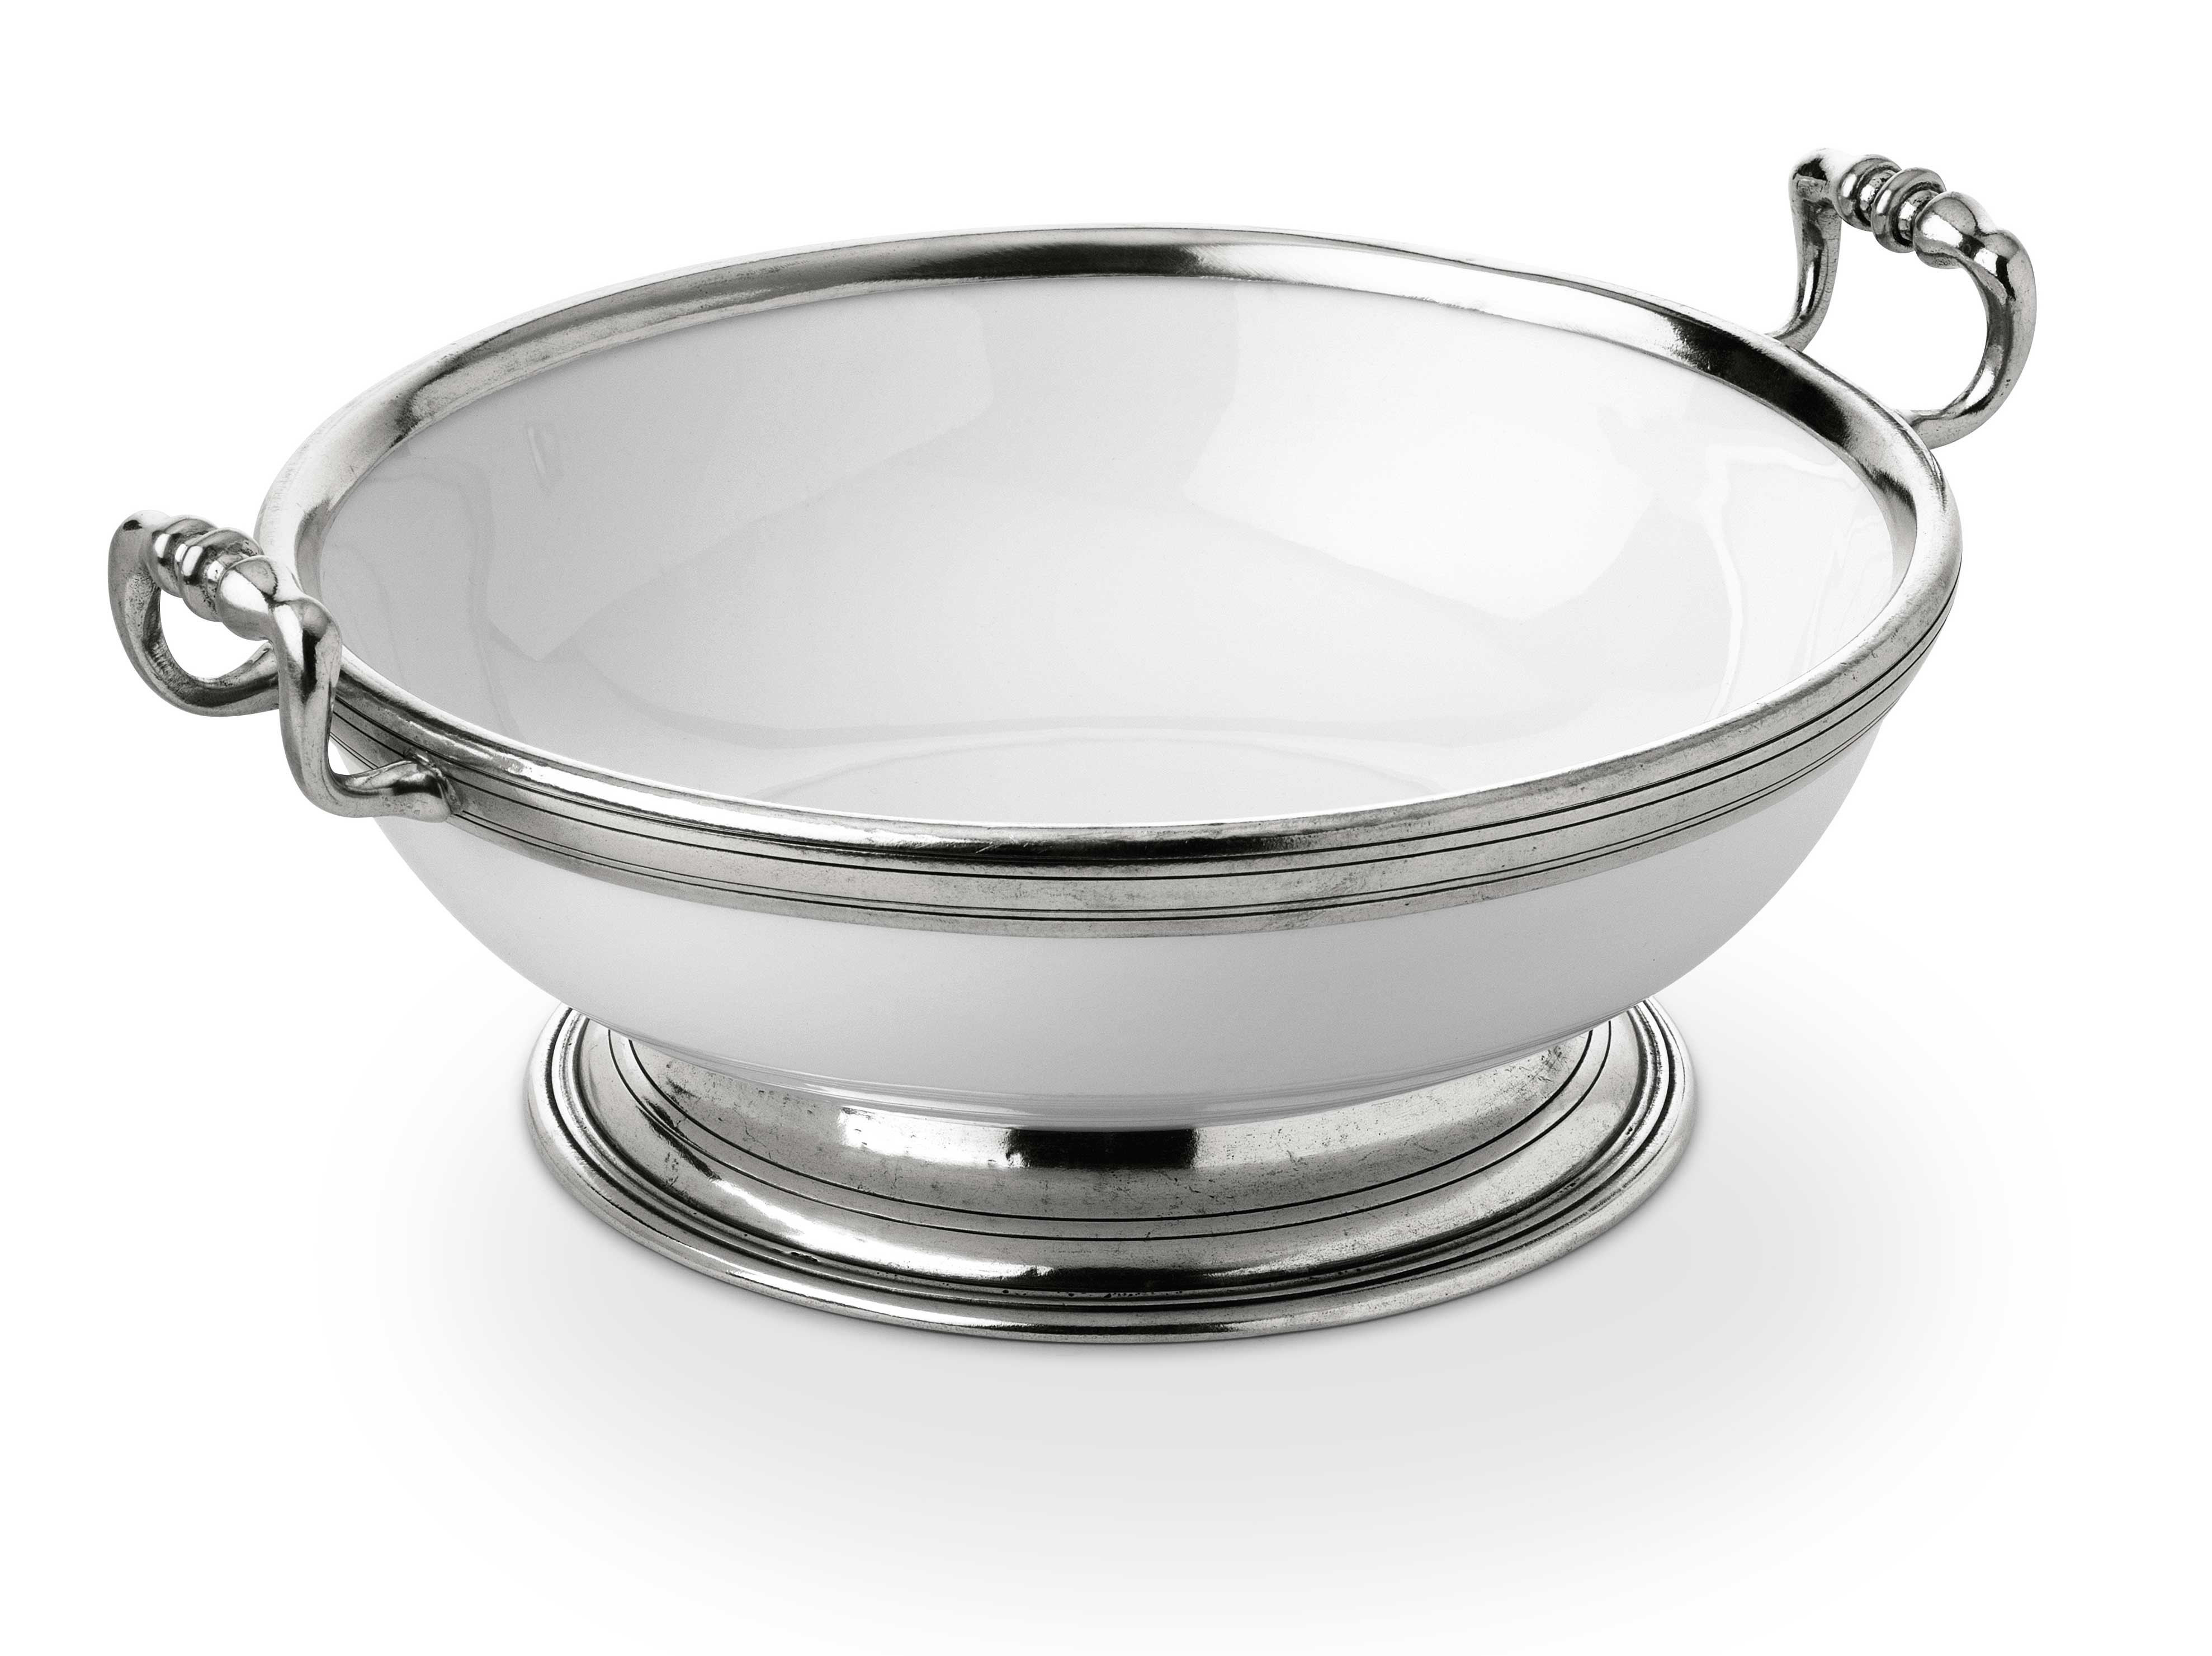 Pewter Amp Ceramic Round Fruit Bowl W Handles 248 26 H 10 Cm Peltro Pewter Shop Online